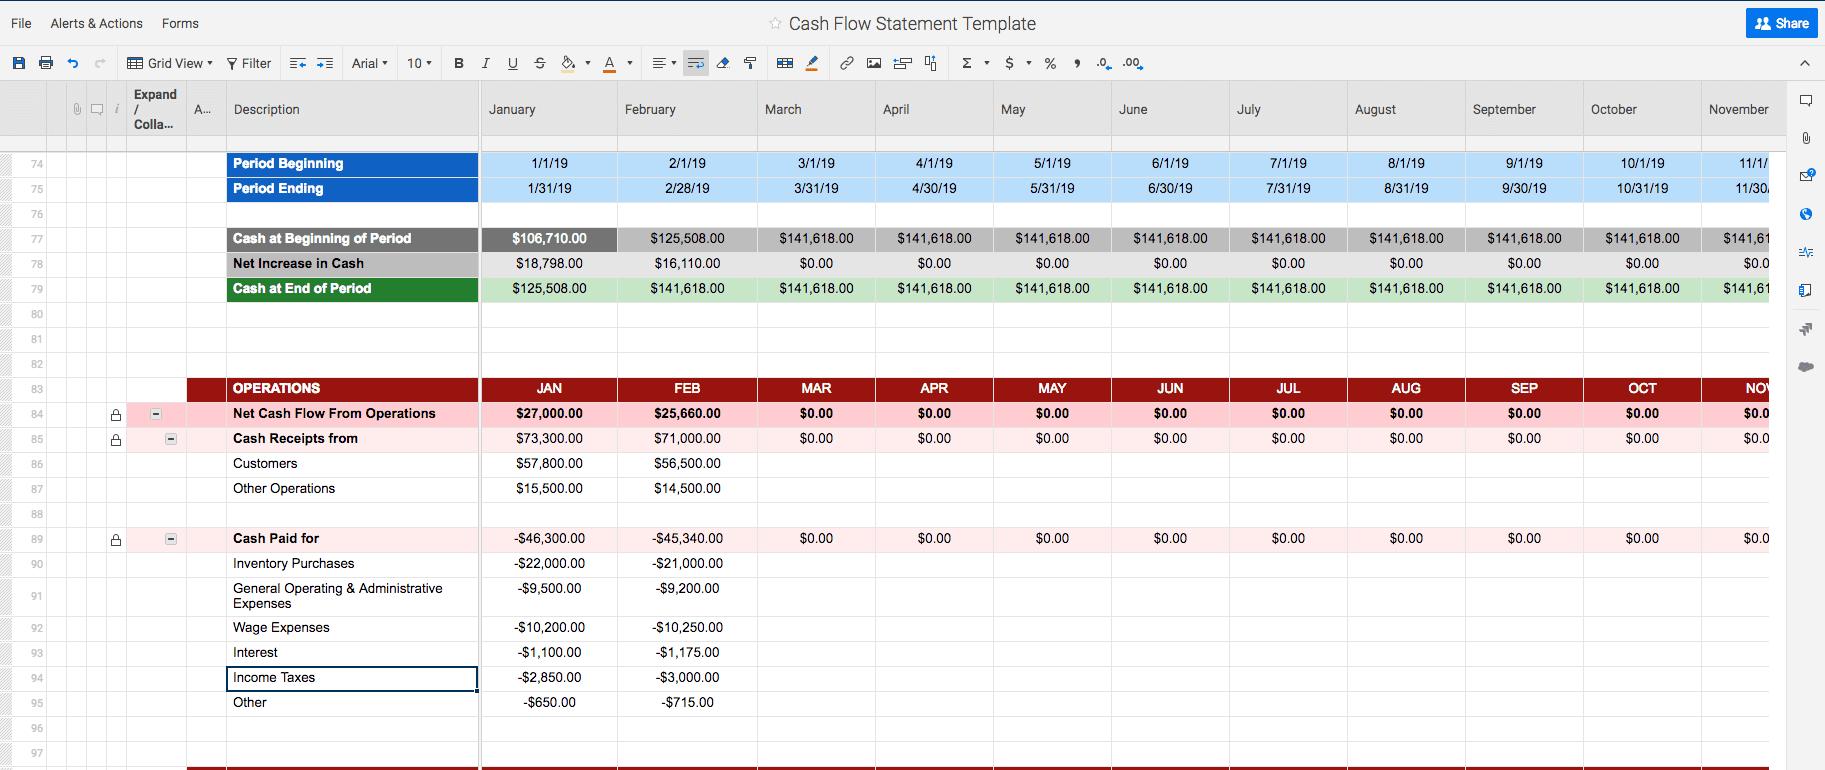 Free Cash Flow Statement Templates   Smartsheet Throughout Cash Position Report Template